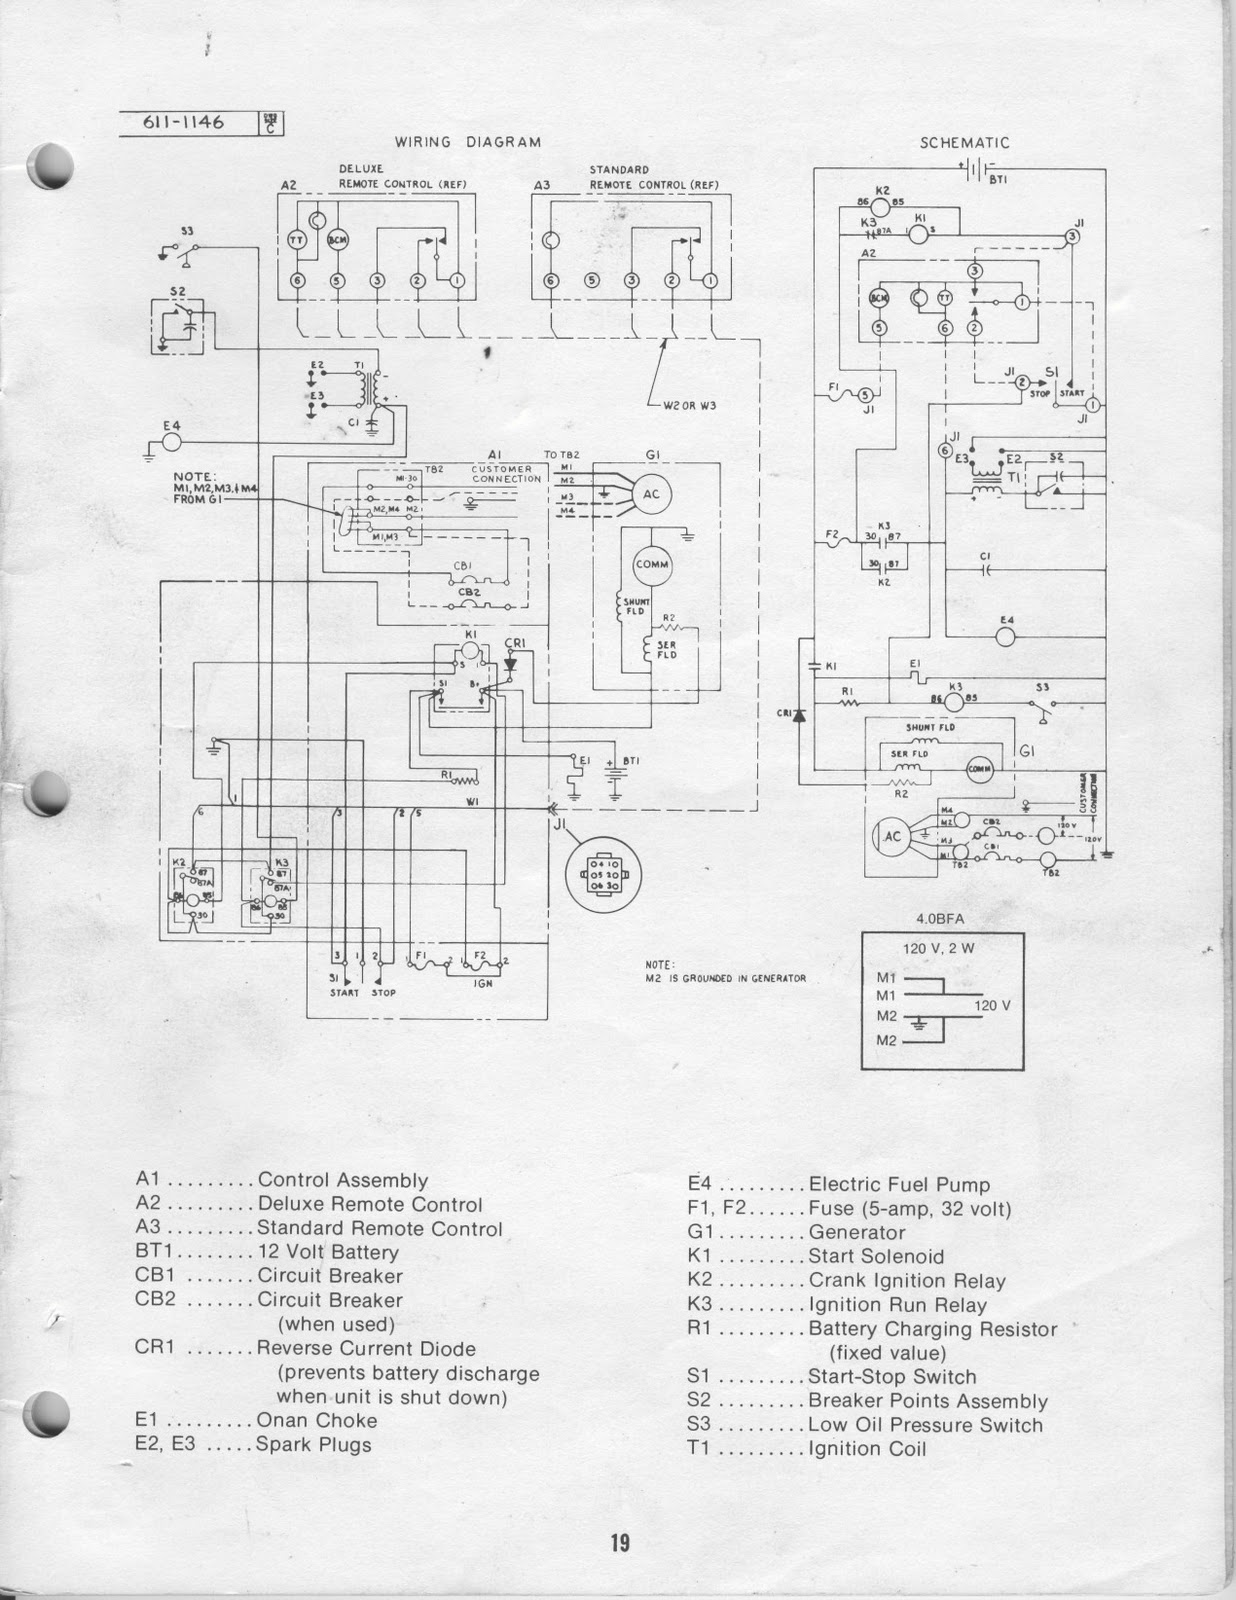 Wiring Diagram Onan Genset Australian Xr650r 1983 Fleetwood Pace Arrow Owners Manuals 4 Kw Bfa